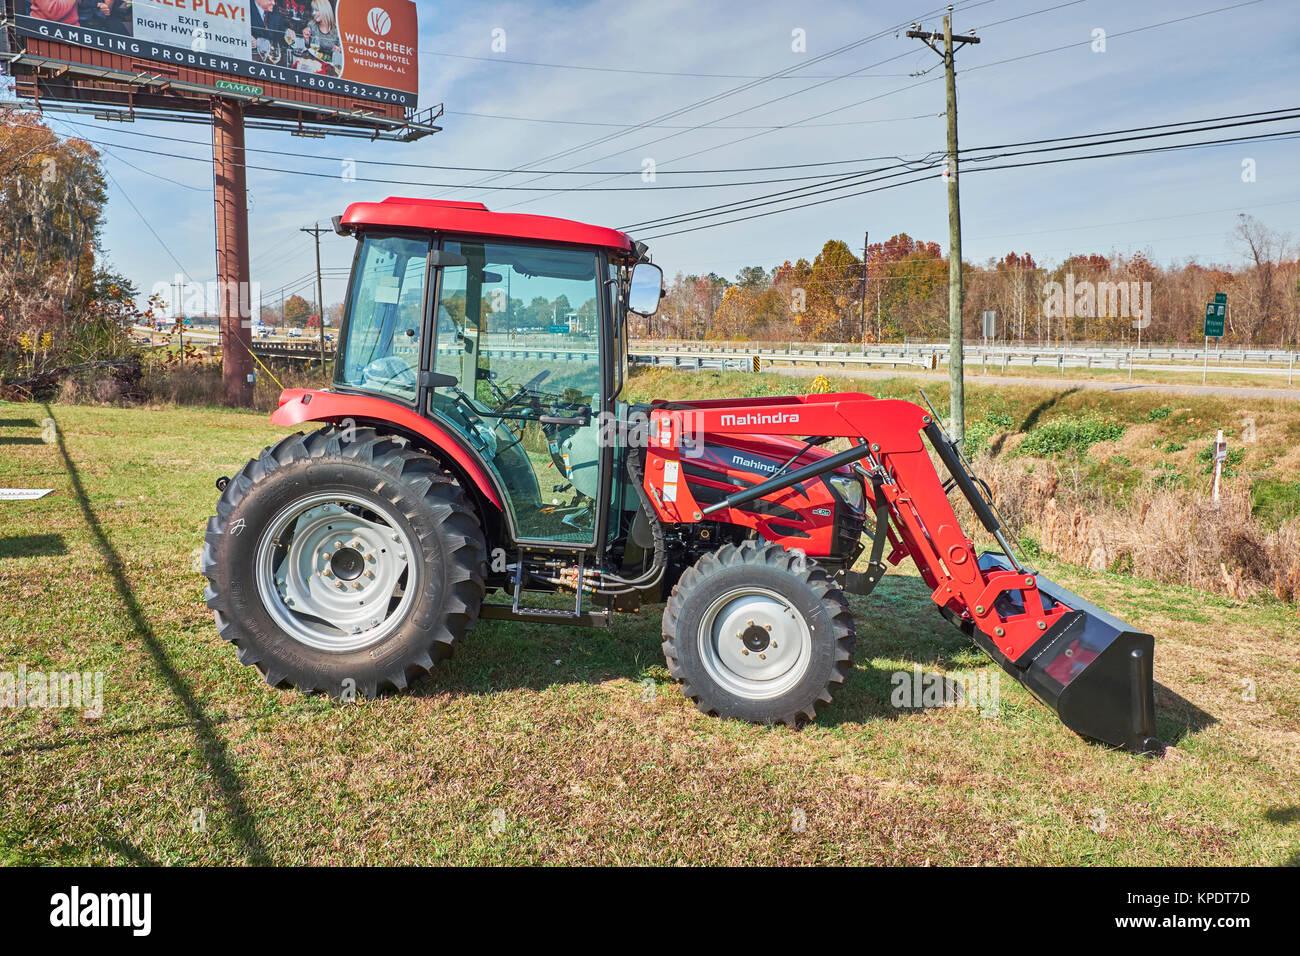 mahindra tractor stockfotos mahindra tractor bilder alamy. Black Bedroom Furniture Sets. Home Design Ideas